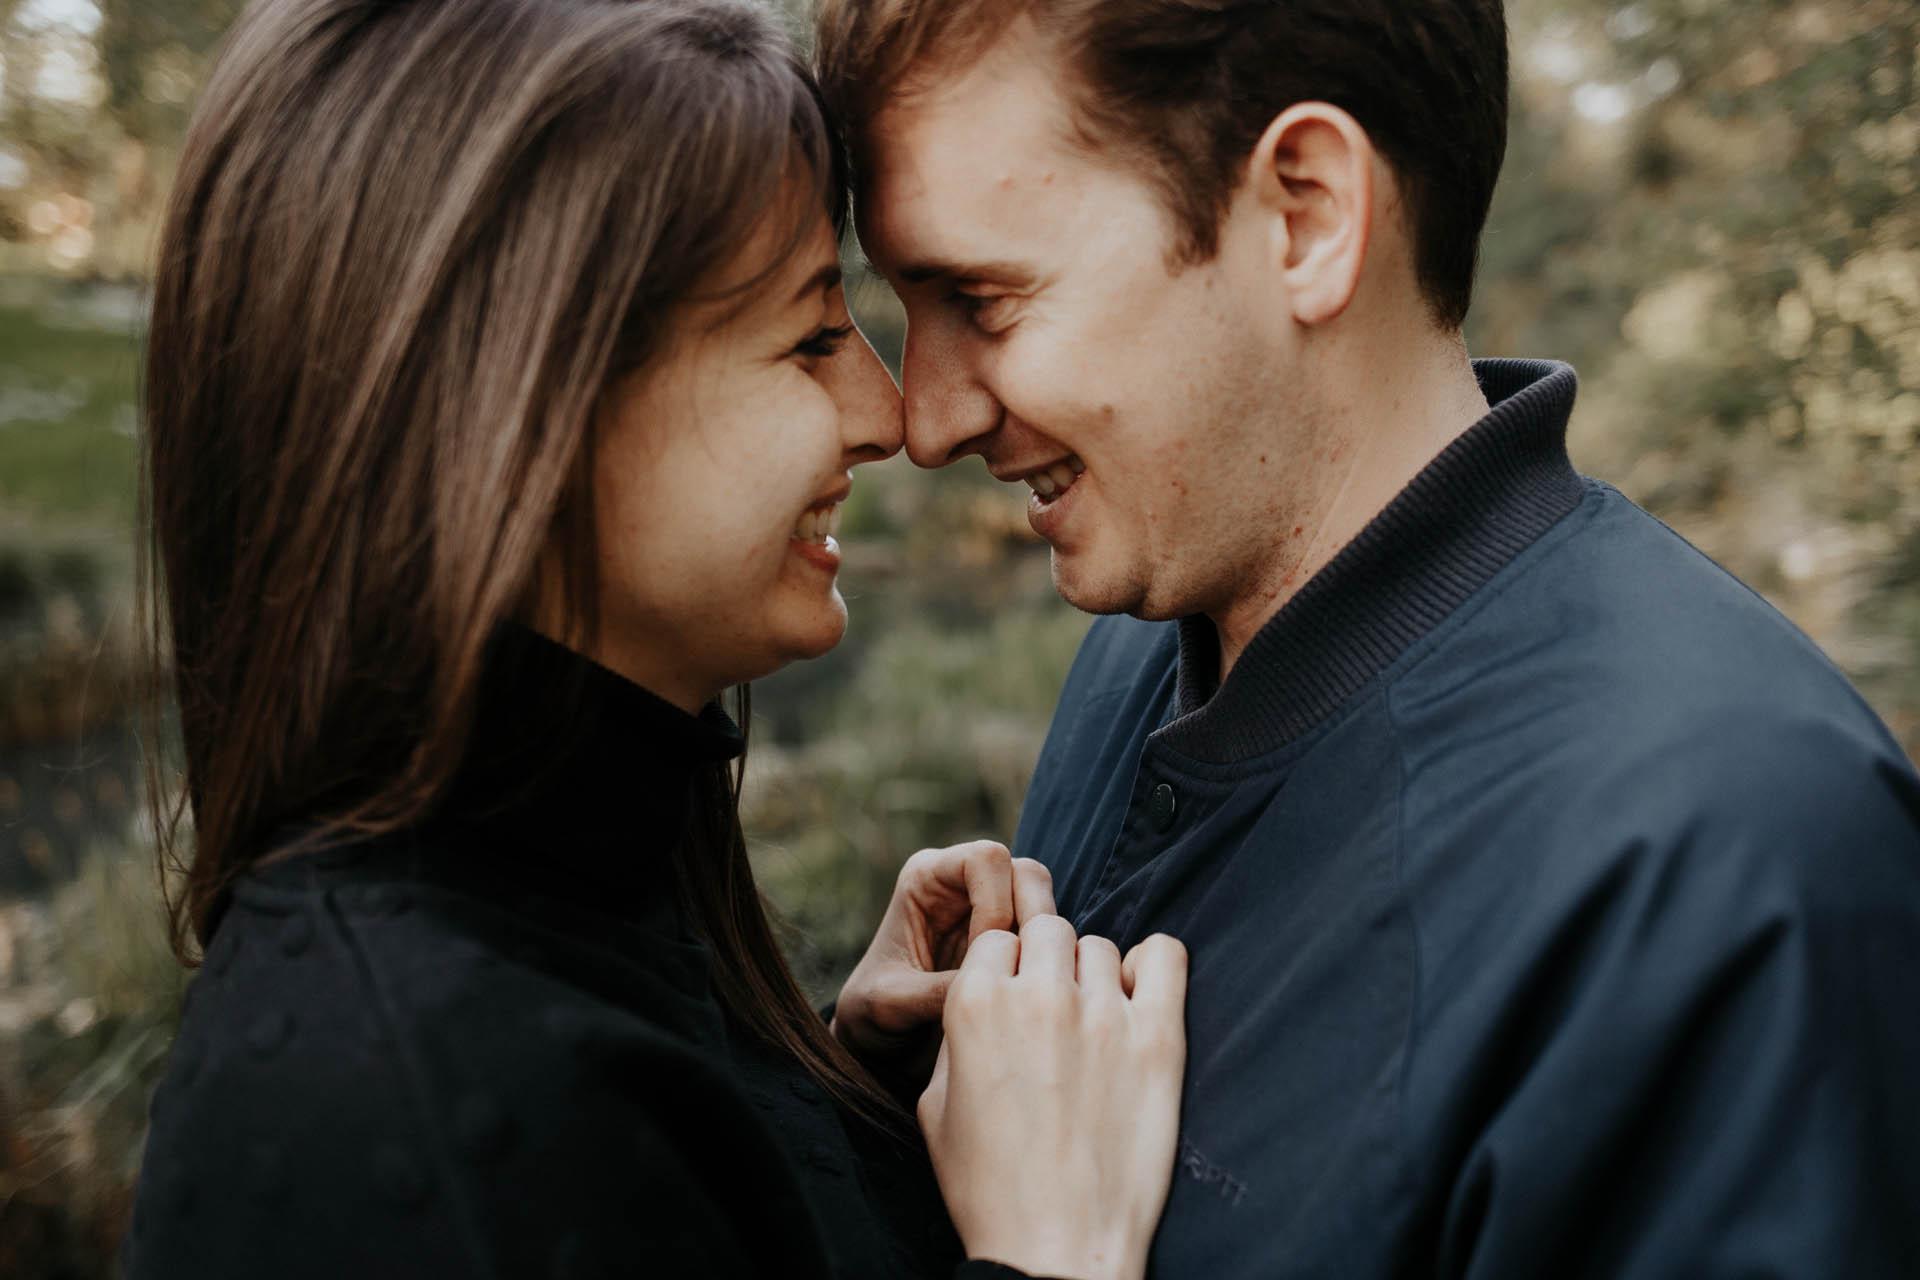 engagement_session_nantes_parc_flavie_nelly_photographe_mariage-42